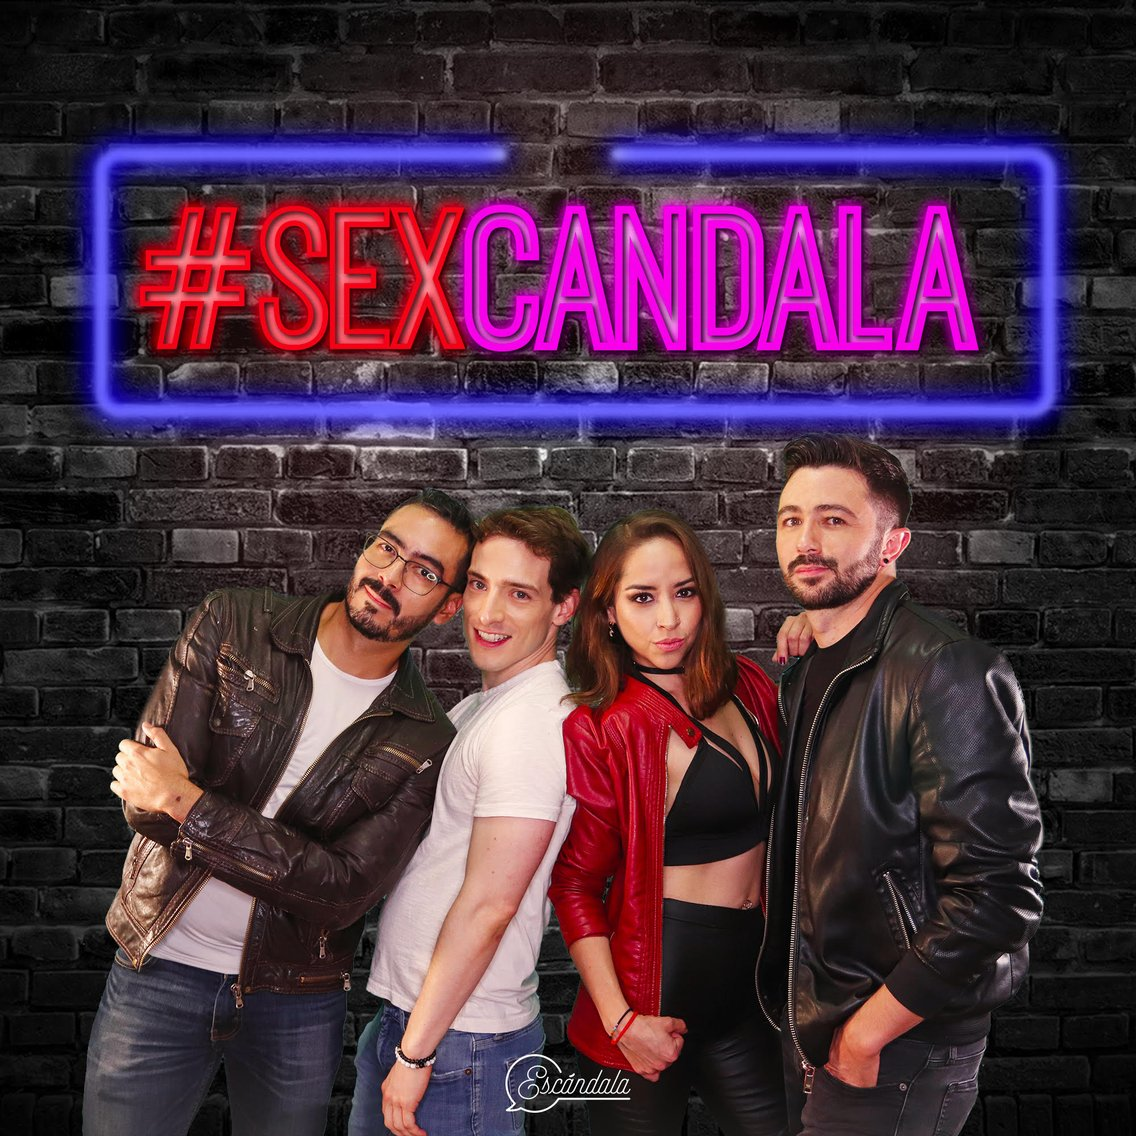 Sexcándala - immagine di copertina